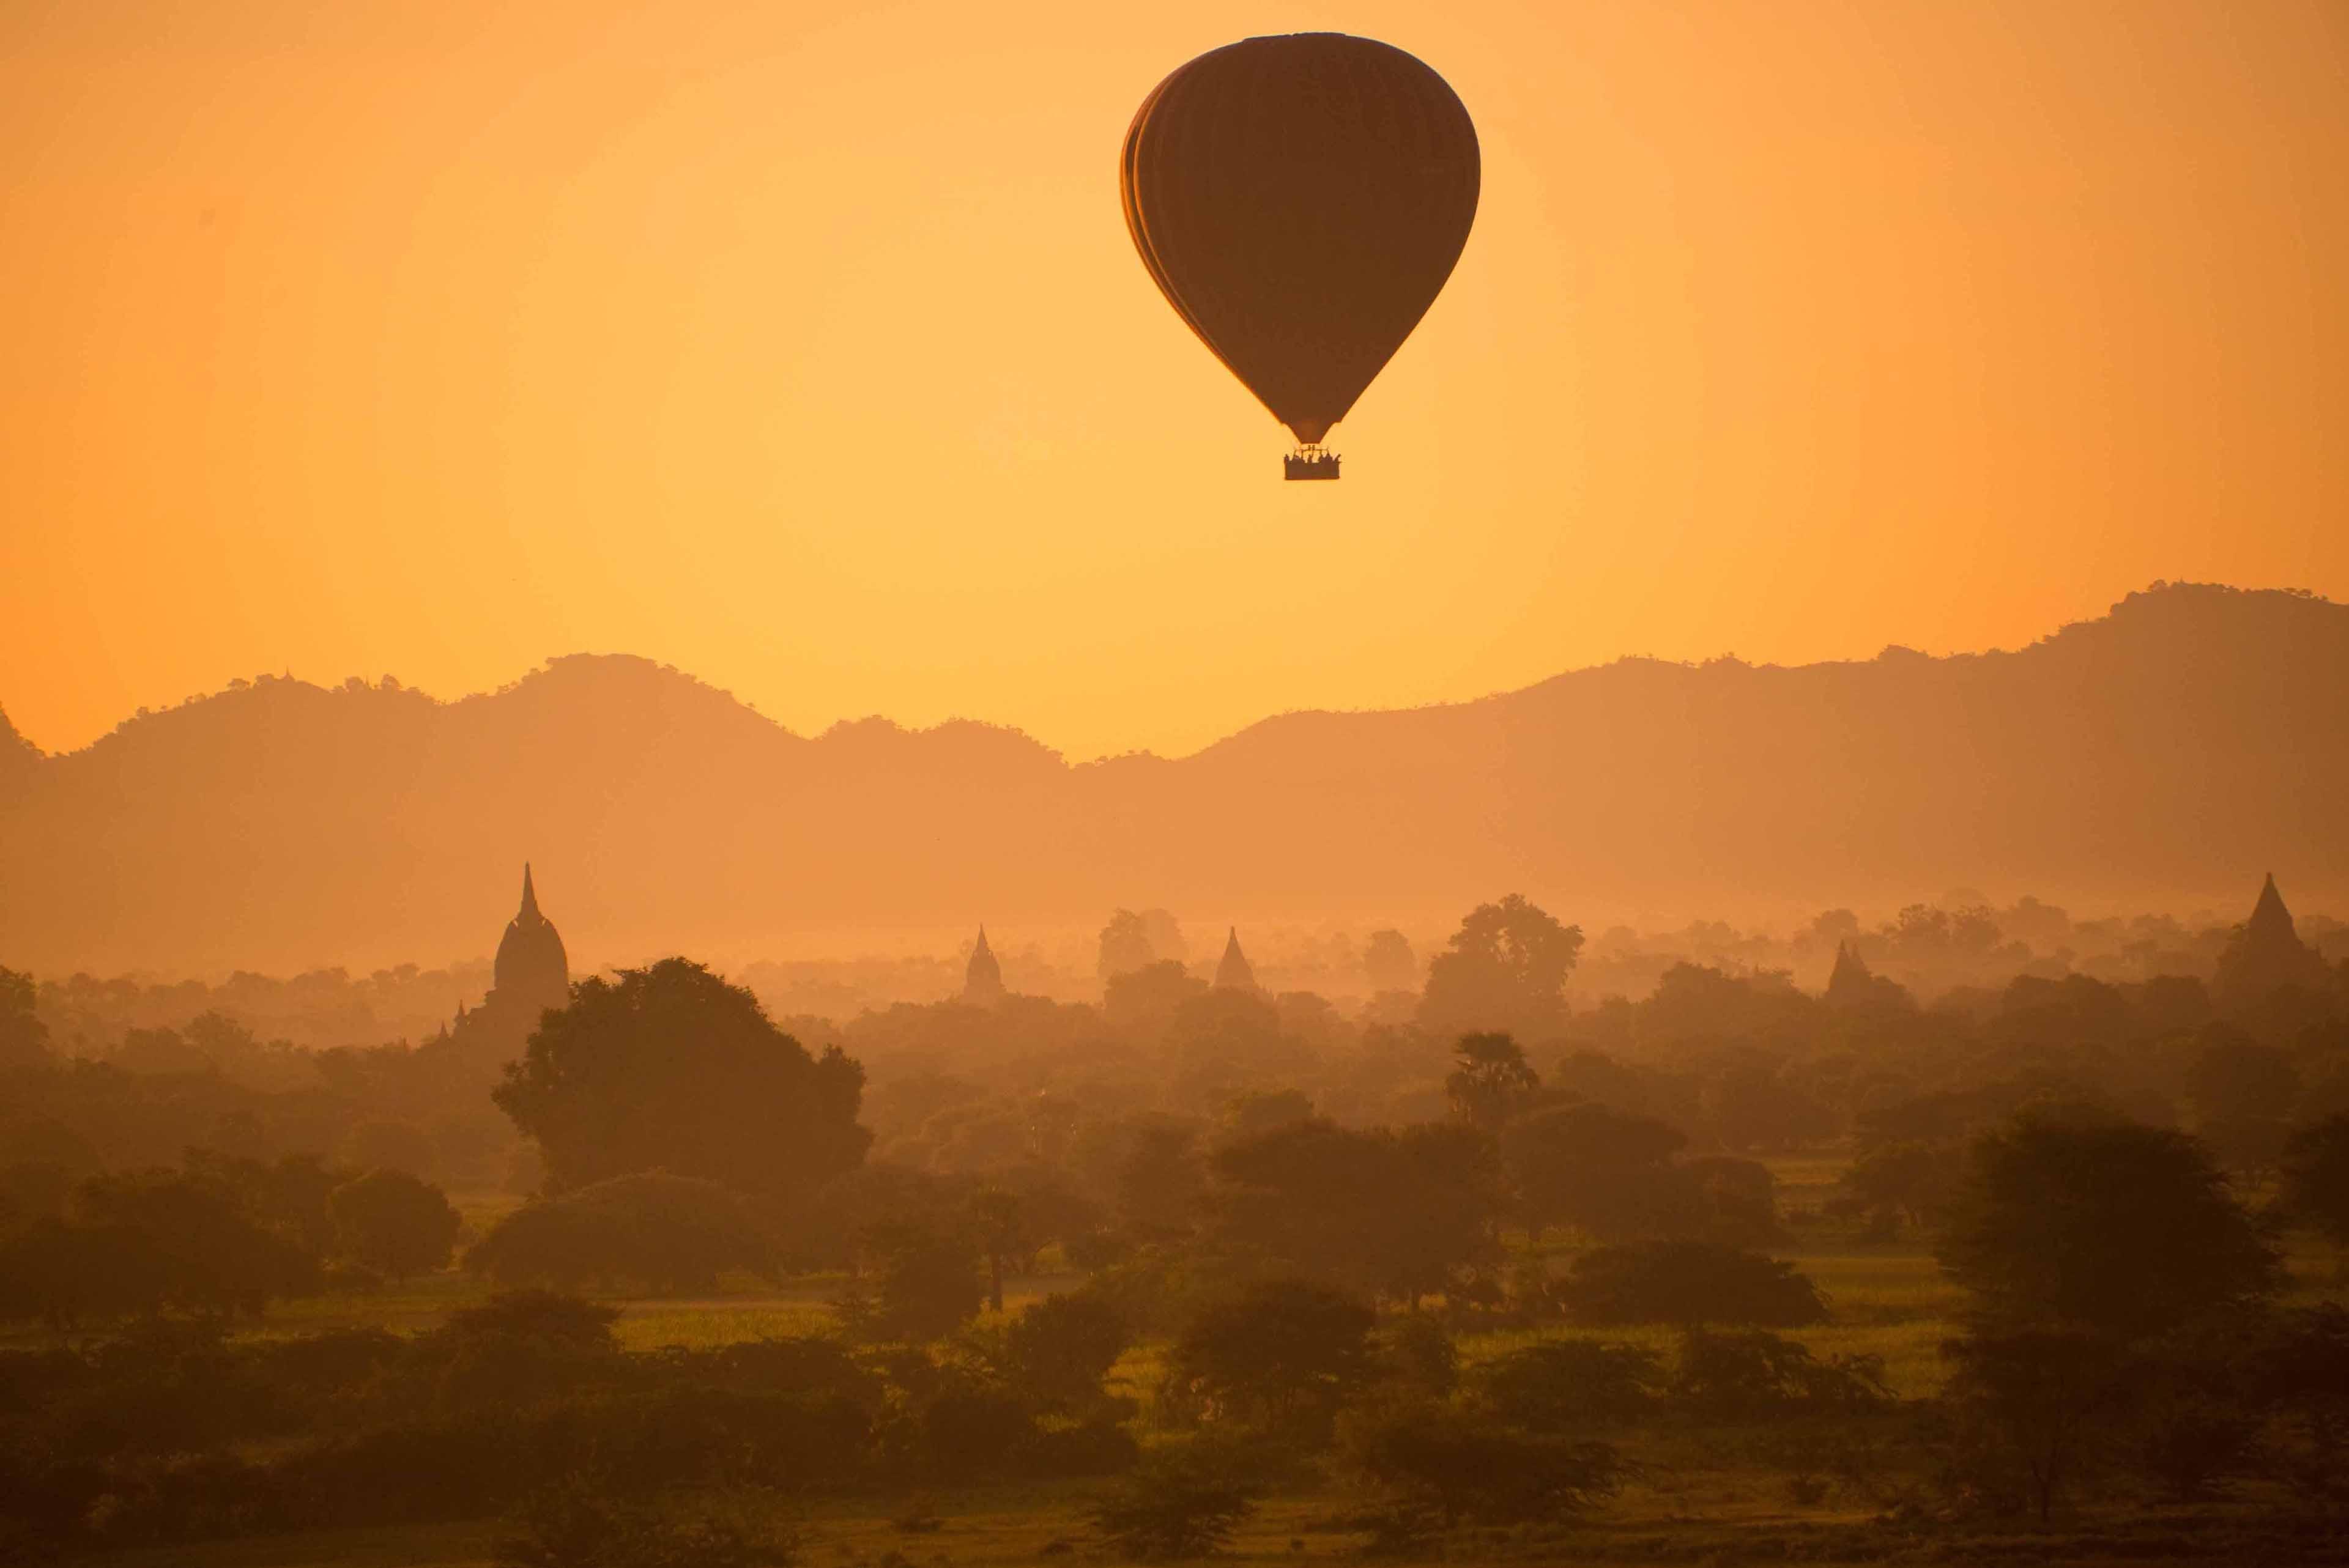 Nancy Brown, Balloon Over Bagan, 2014, Photograph, 38 x 48 inches